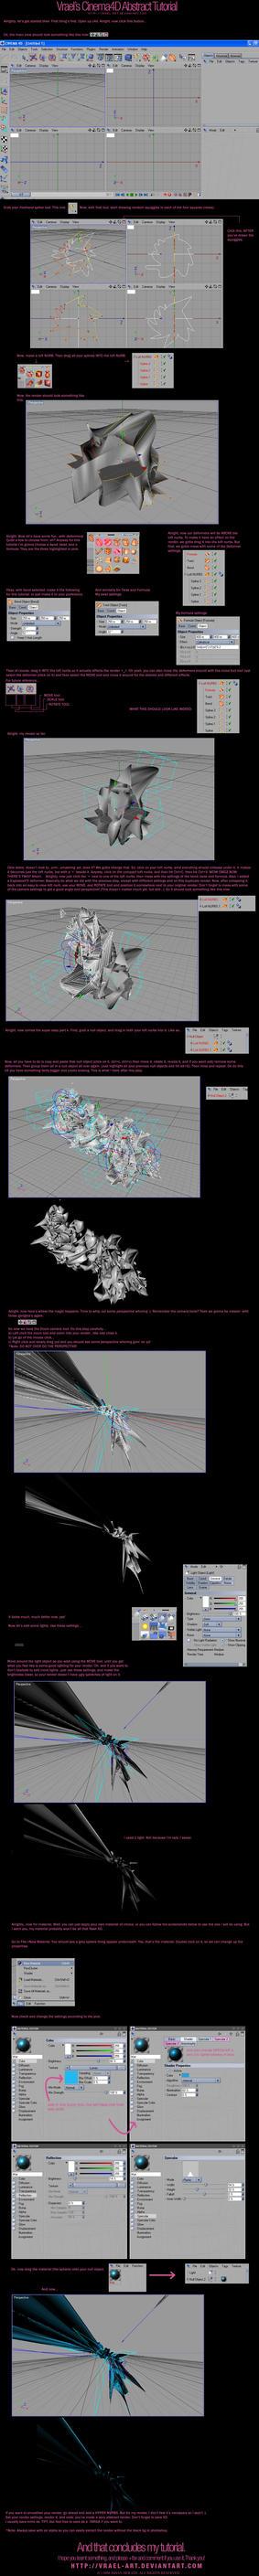 Vrael's C4D Abstract Tutorial by vrael-art